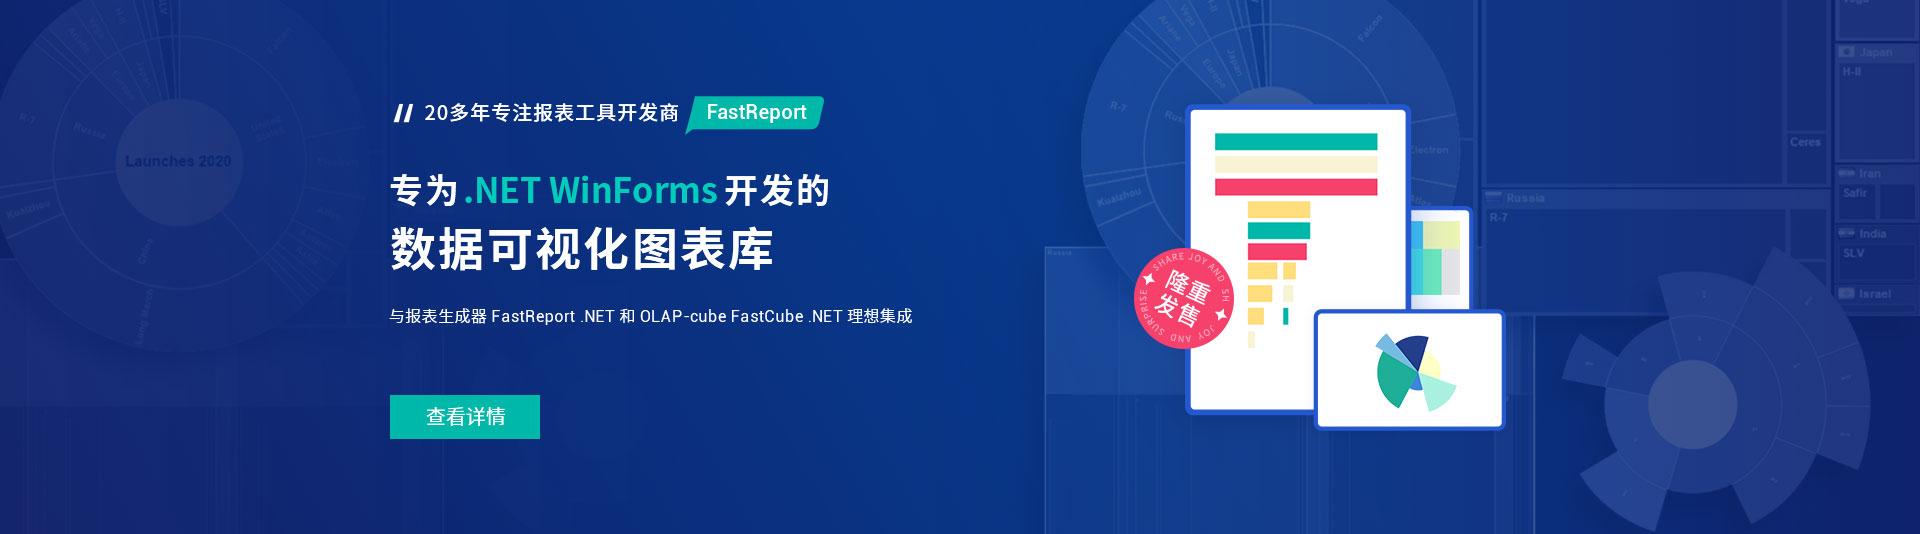 Fastreport专为.NET WinForms开发的数据可视化图表库隆重发布